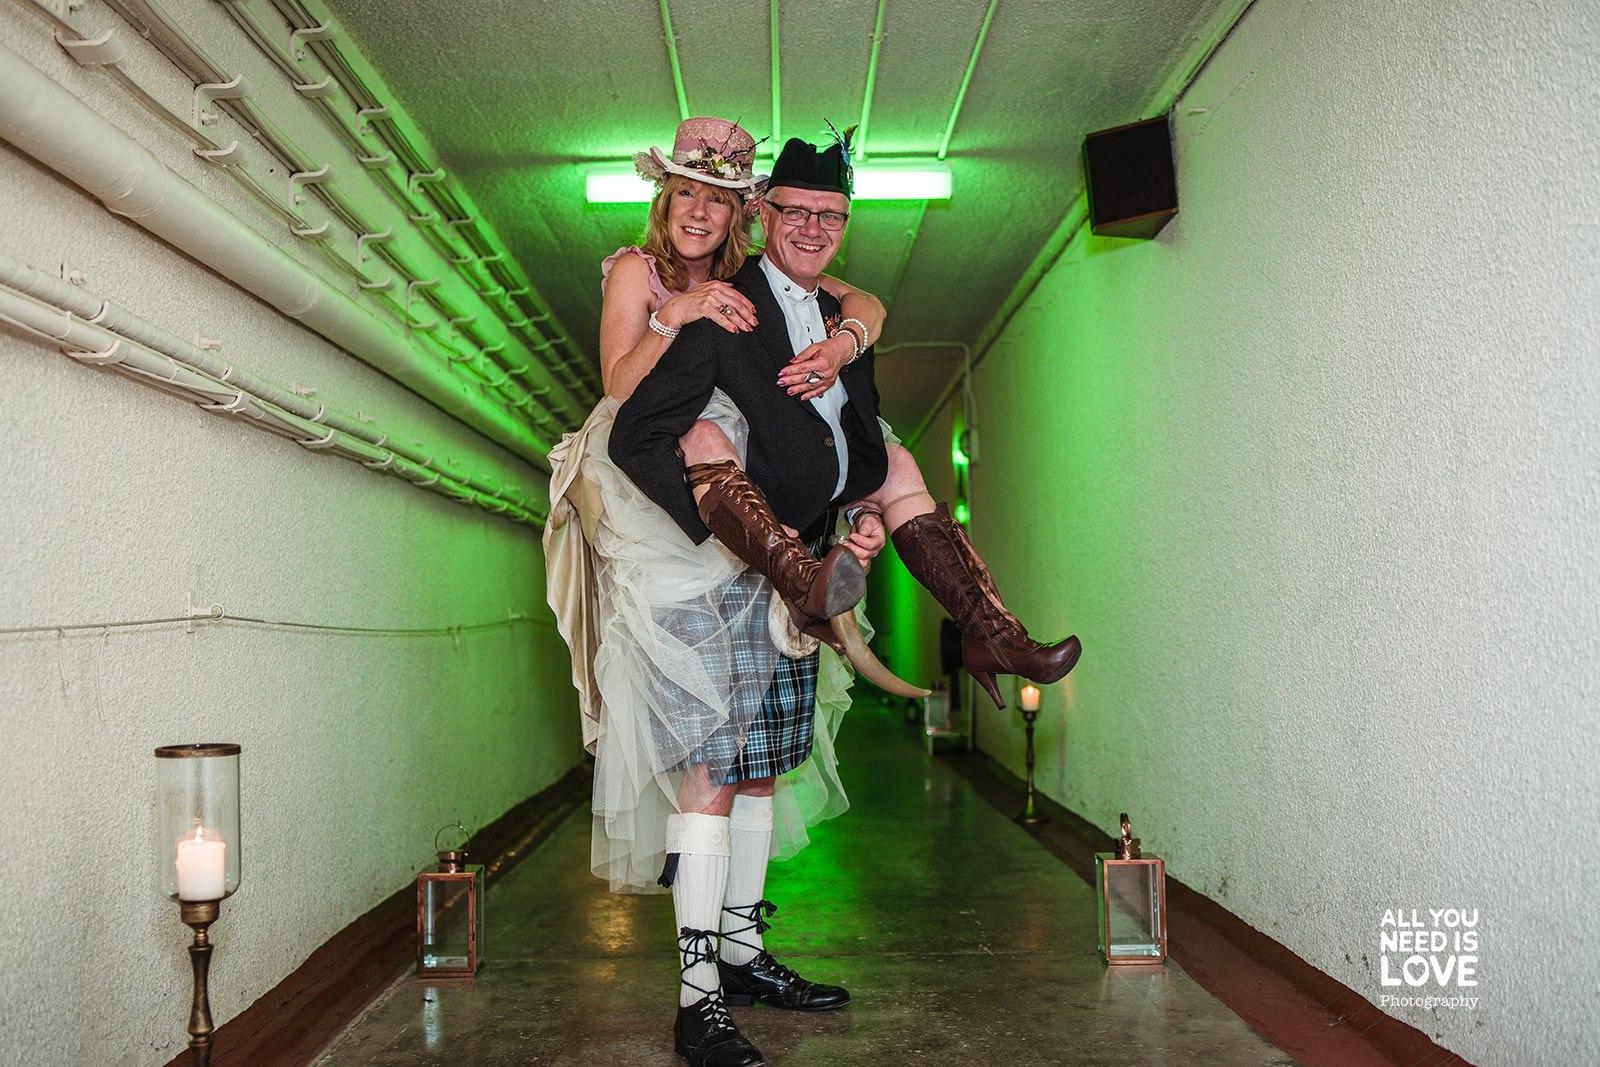 RAF Holmpton- All You Need Is Love Photography- Army Wedding Venue- Historic Wedding Venue- Underground wedding venue- unique wedding venue- the best alternative wedding venues- unconventional wedding-